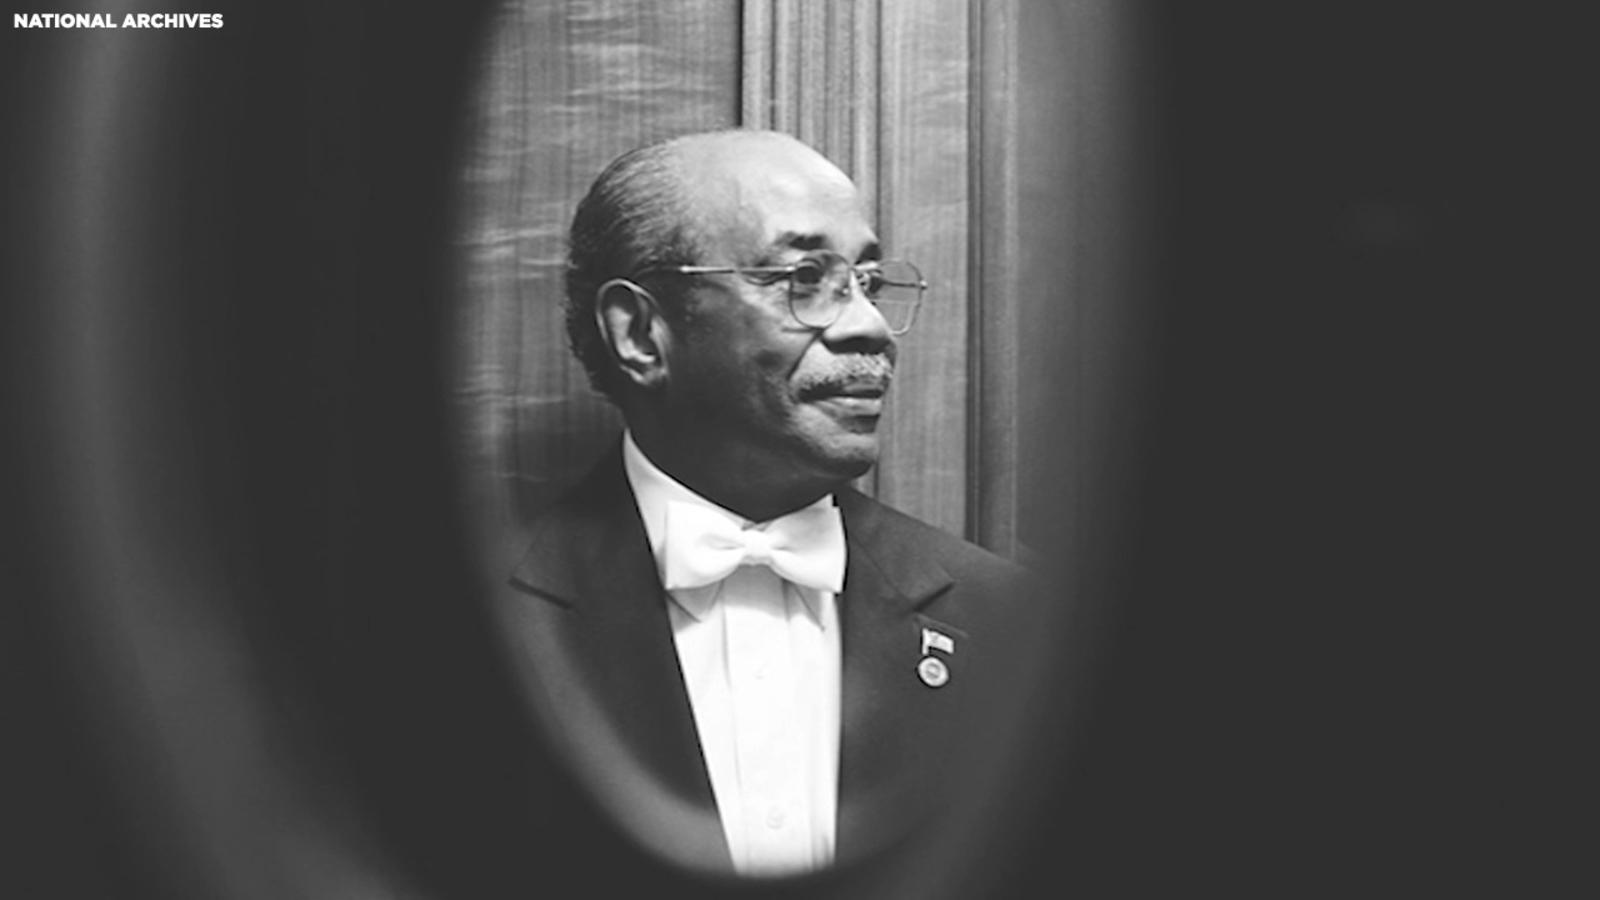 Wilson Jerman, White House butler who served 11 first families, dies of coronavirus